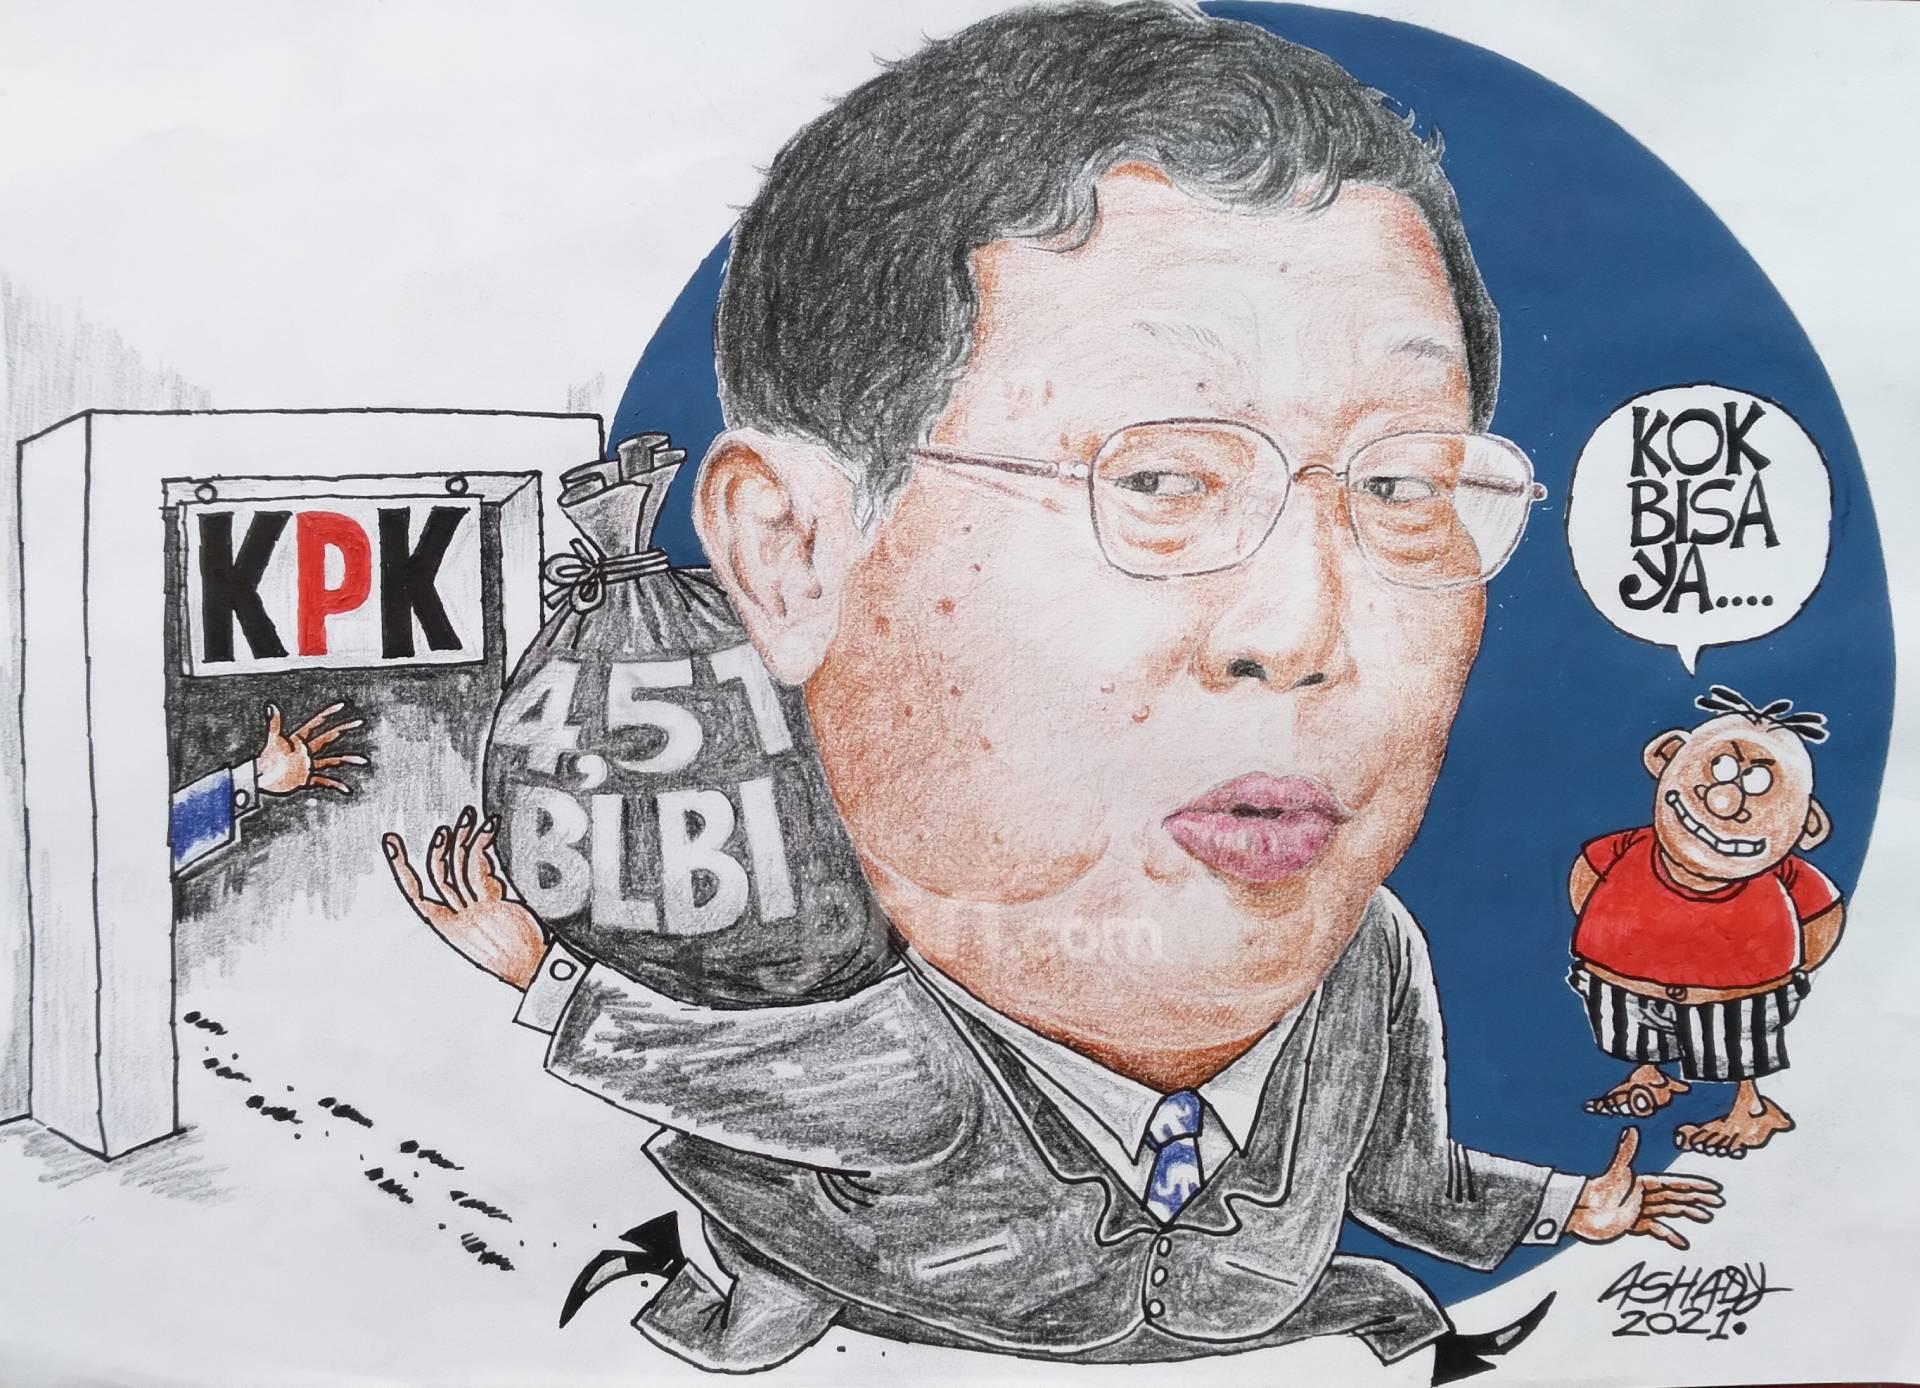 Kok Bisa Lolos. Karikatur oleh Ashady - JPNN.com